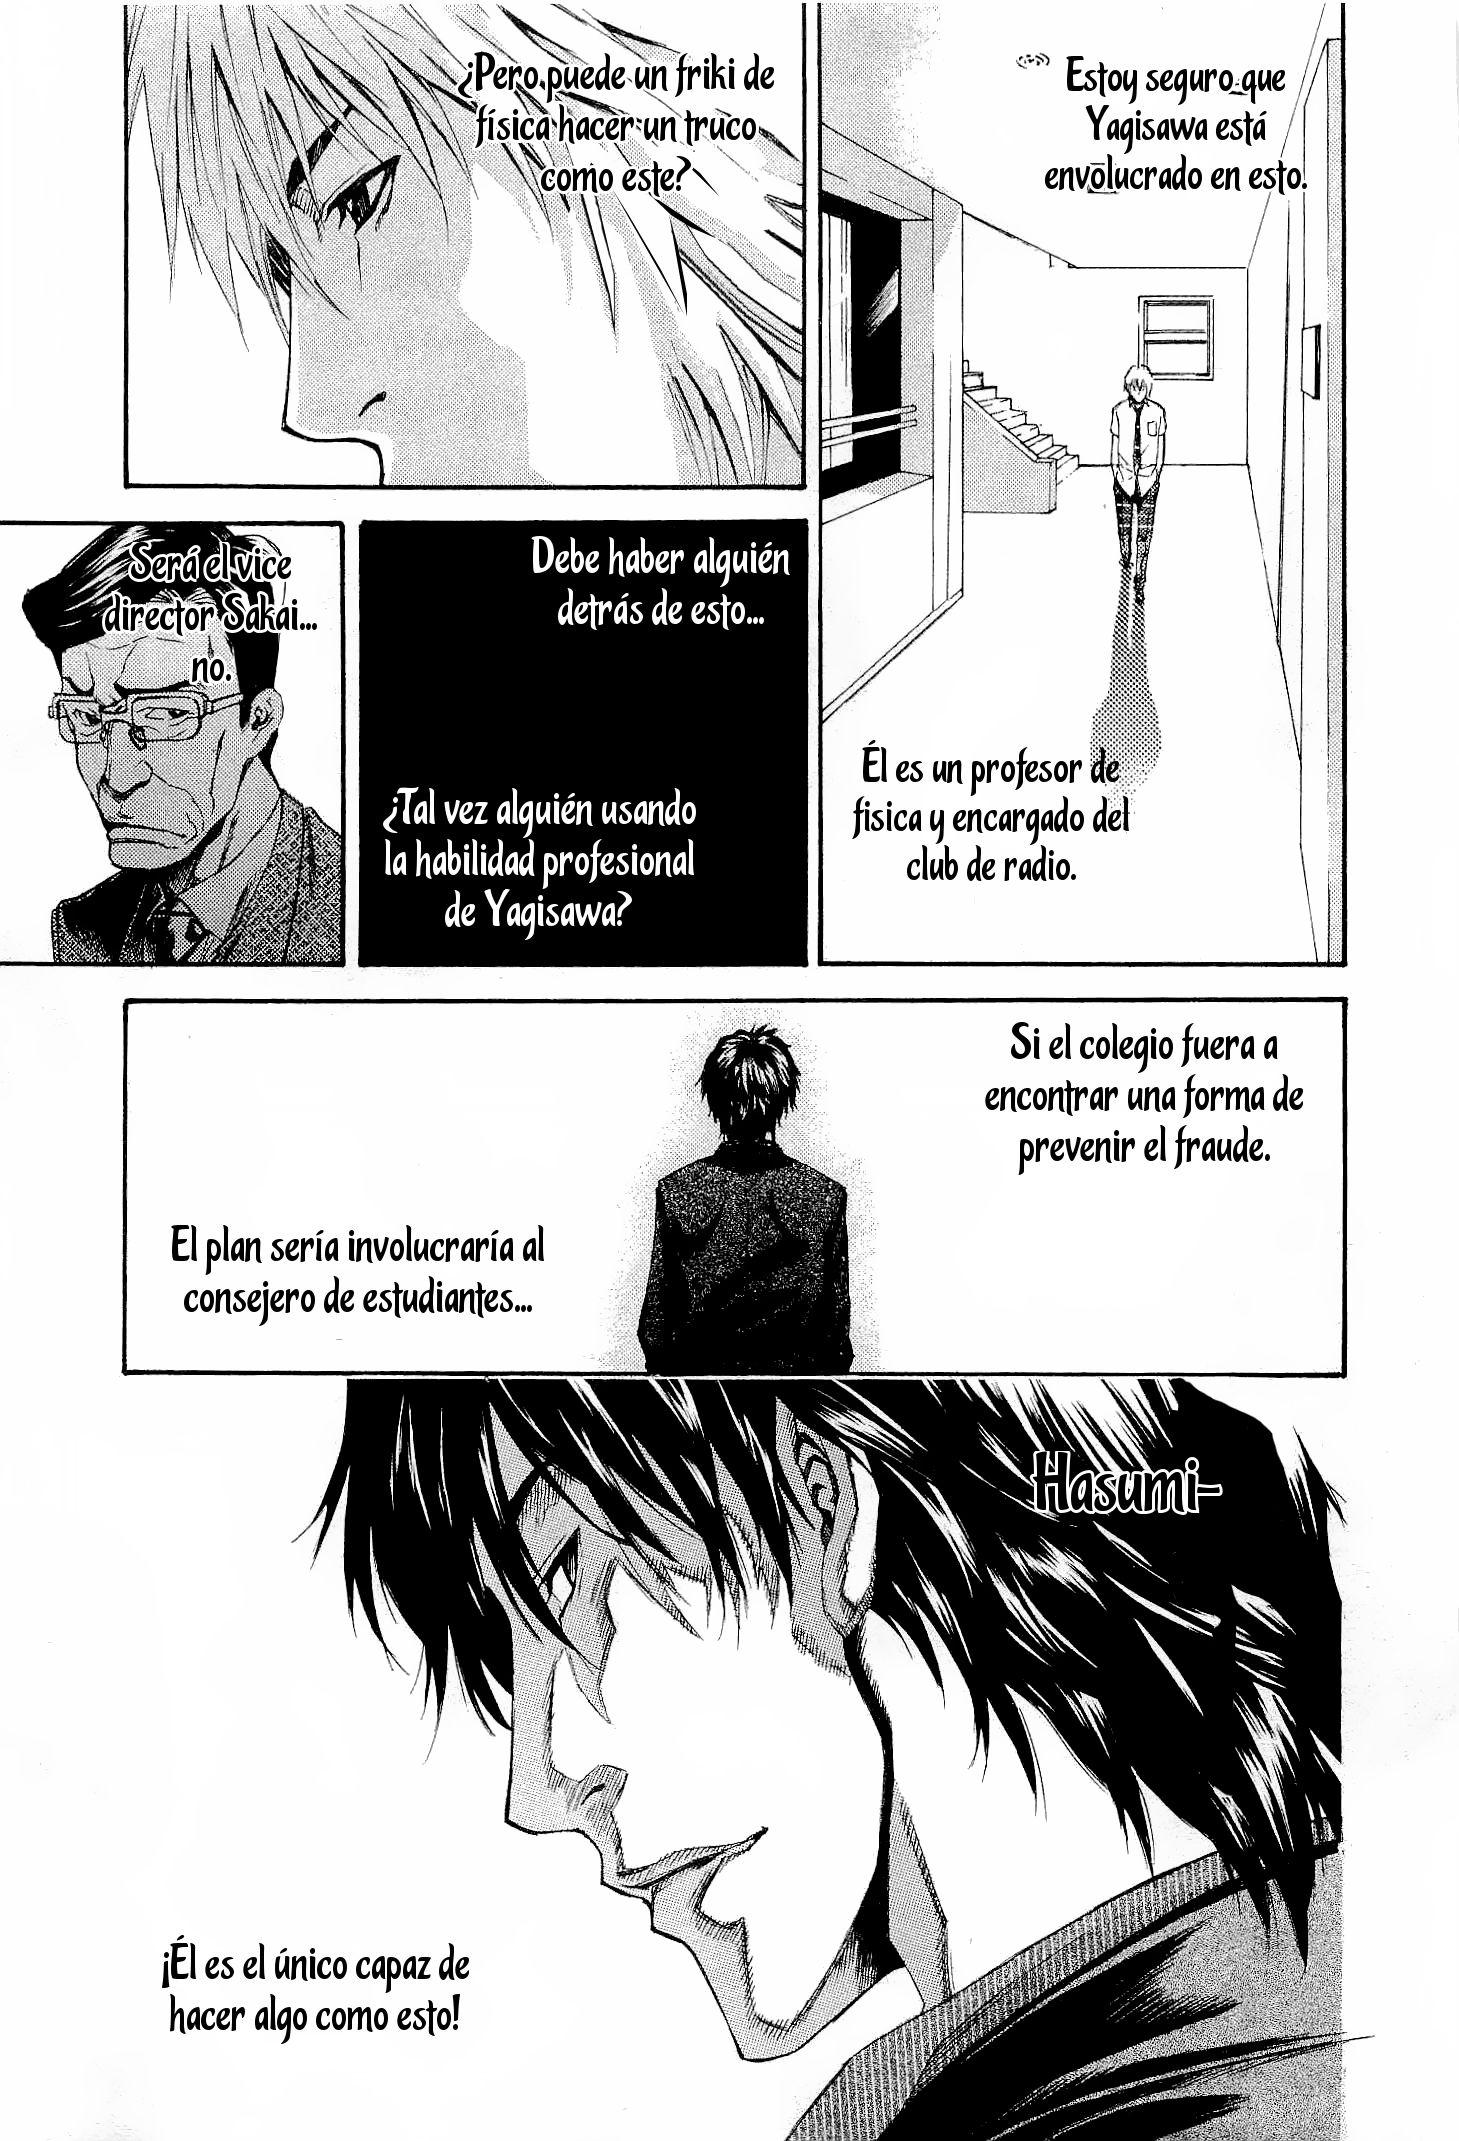 http://c5.ninemanga.com/es_manga/pic2/3/19523/506621/27c552aee35558c28e59d80dffe6d3bb.jpg Page 4